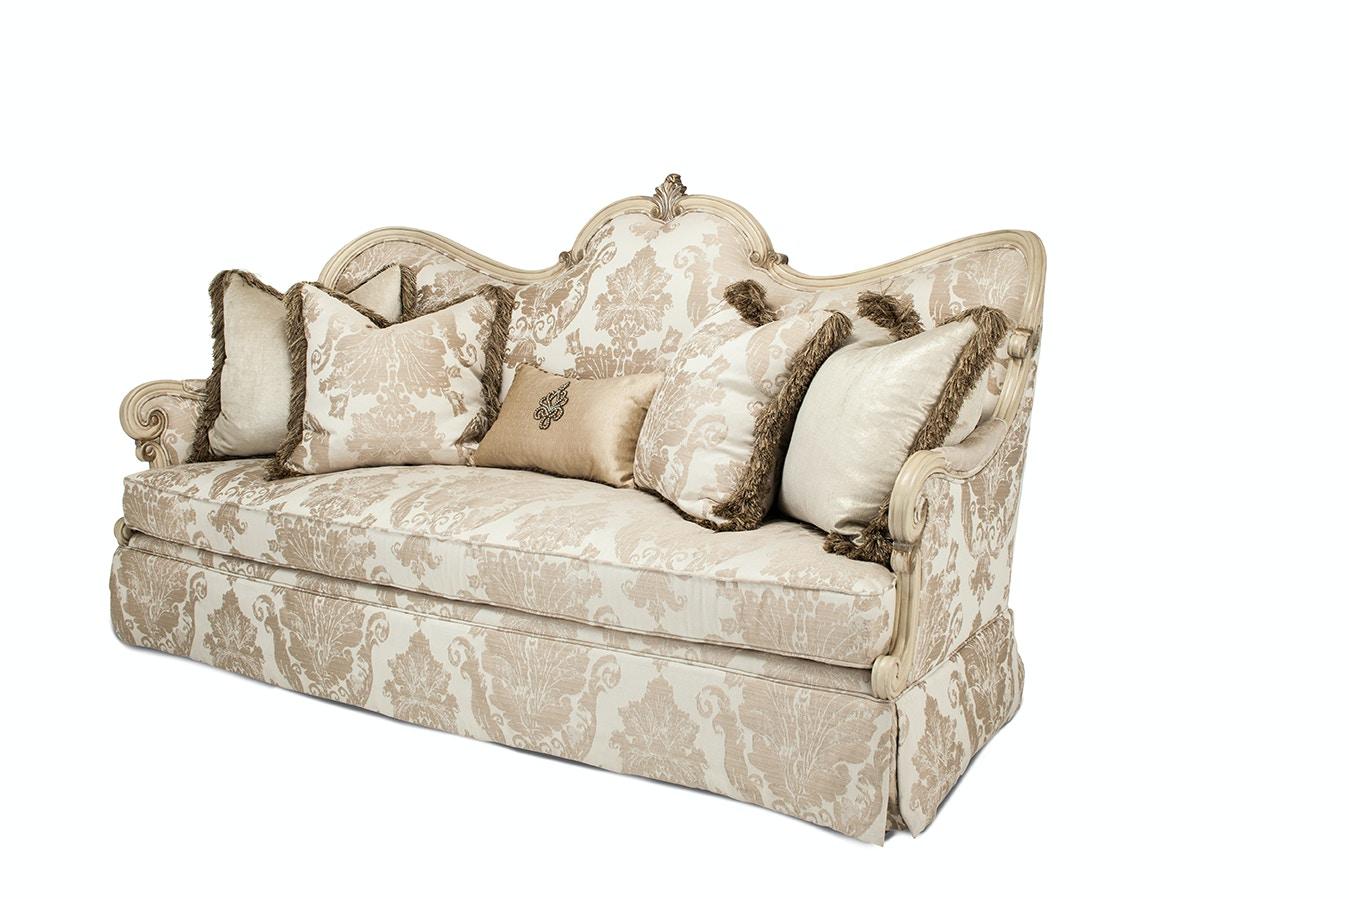 aico furniture platine de royale wood sofa